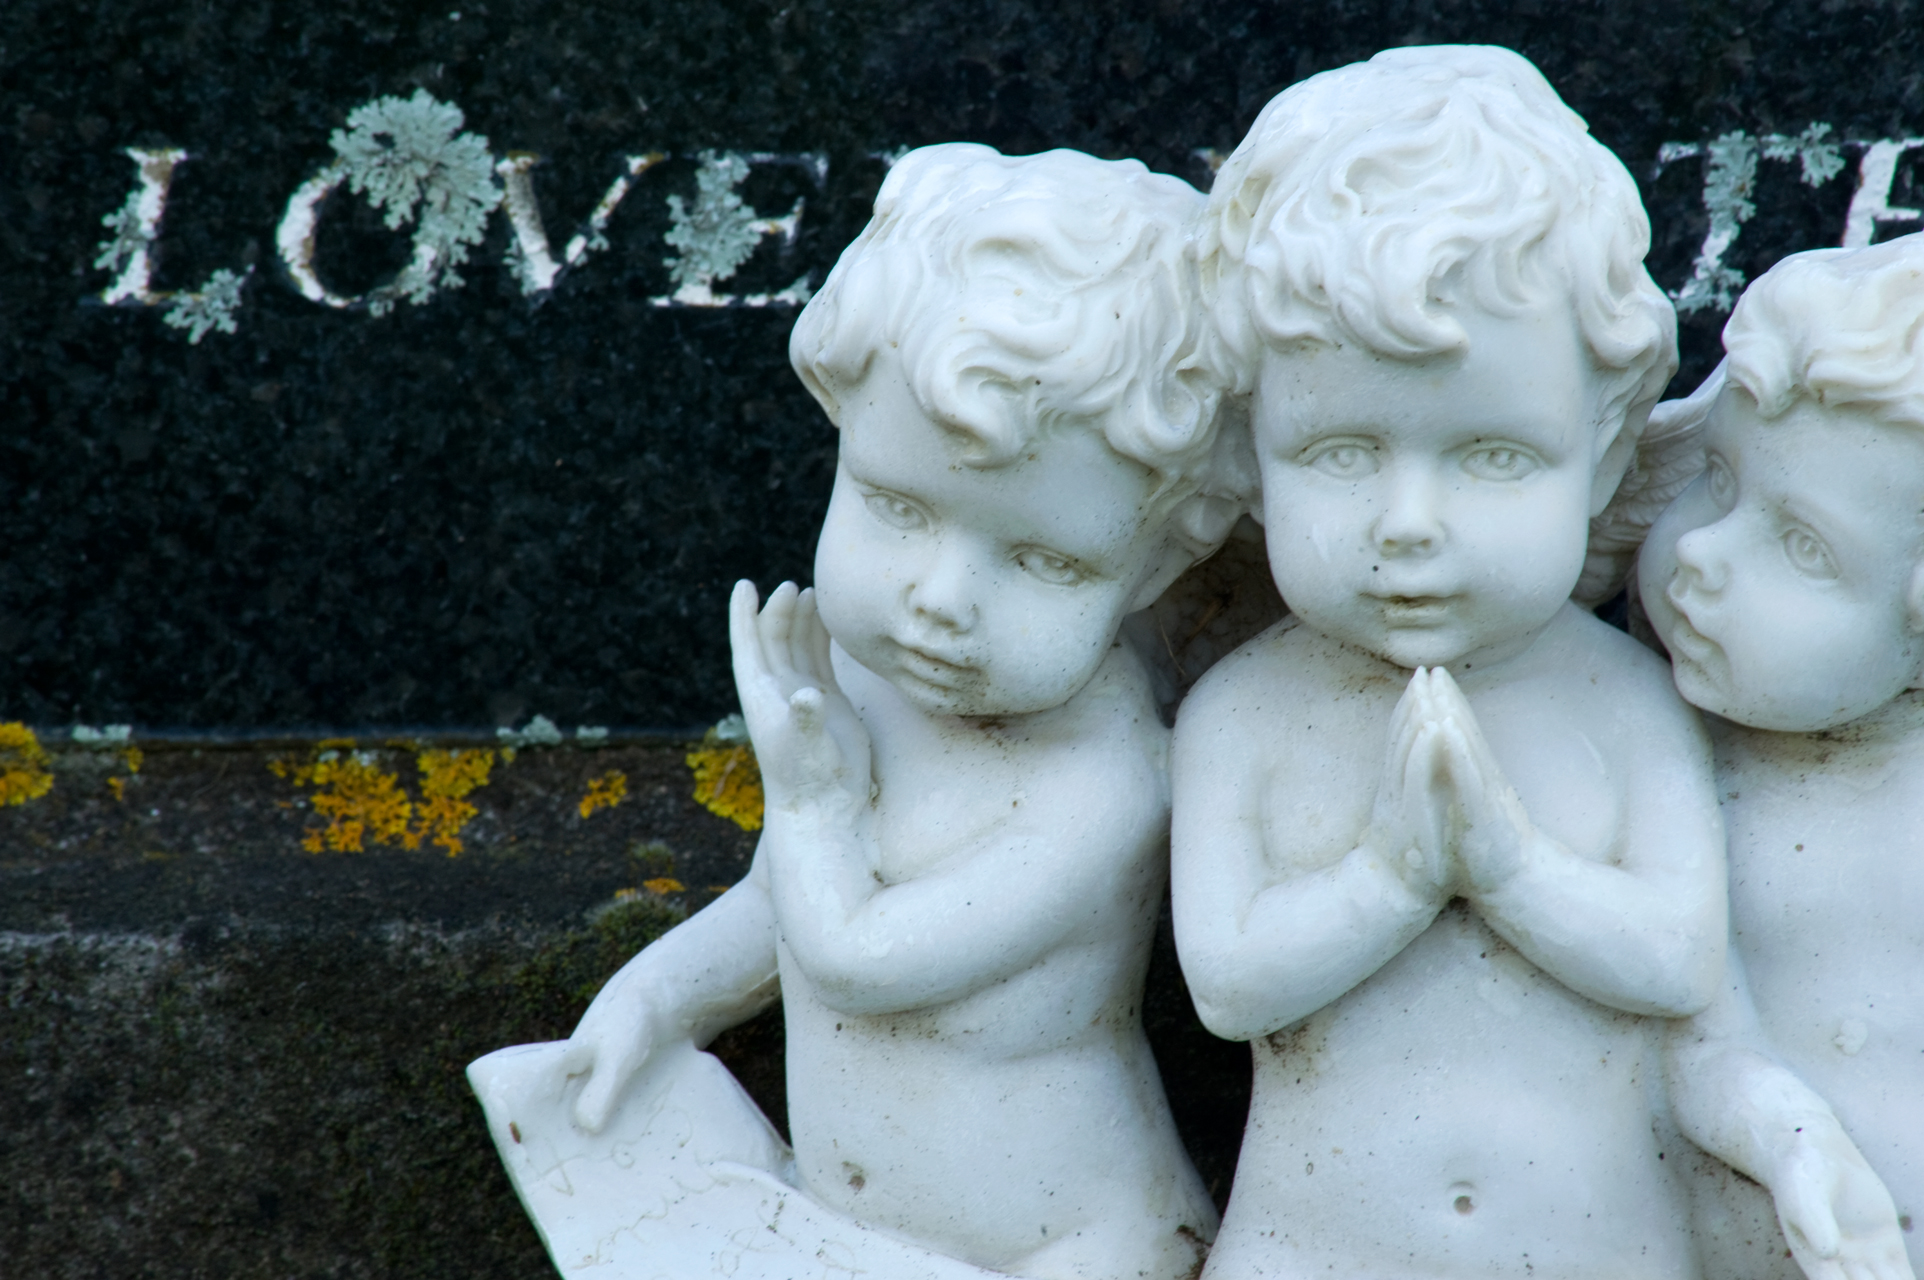 Memento mori 6: Love at Mokau